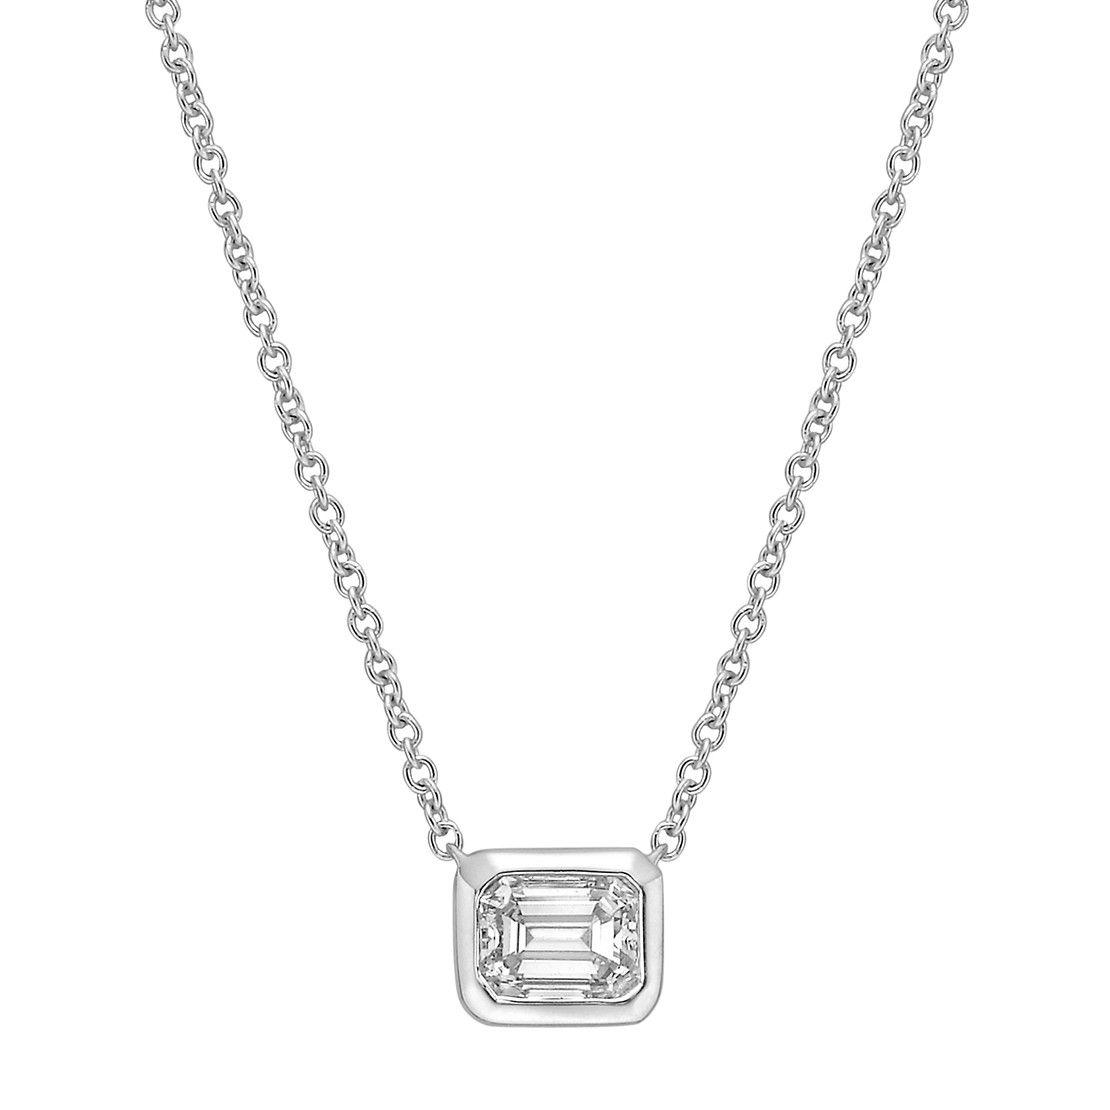 Bezel-Set Emerald-Cut Diamond Solitaire Pendant | Betteridge